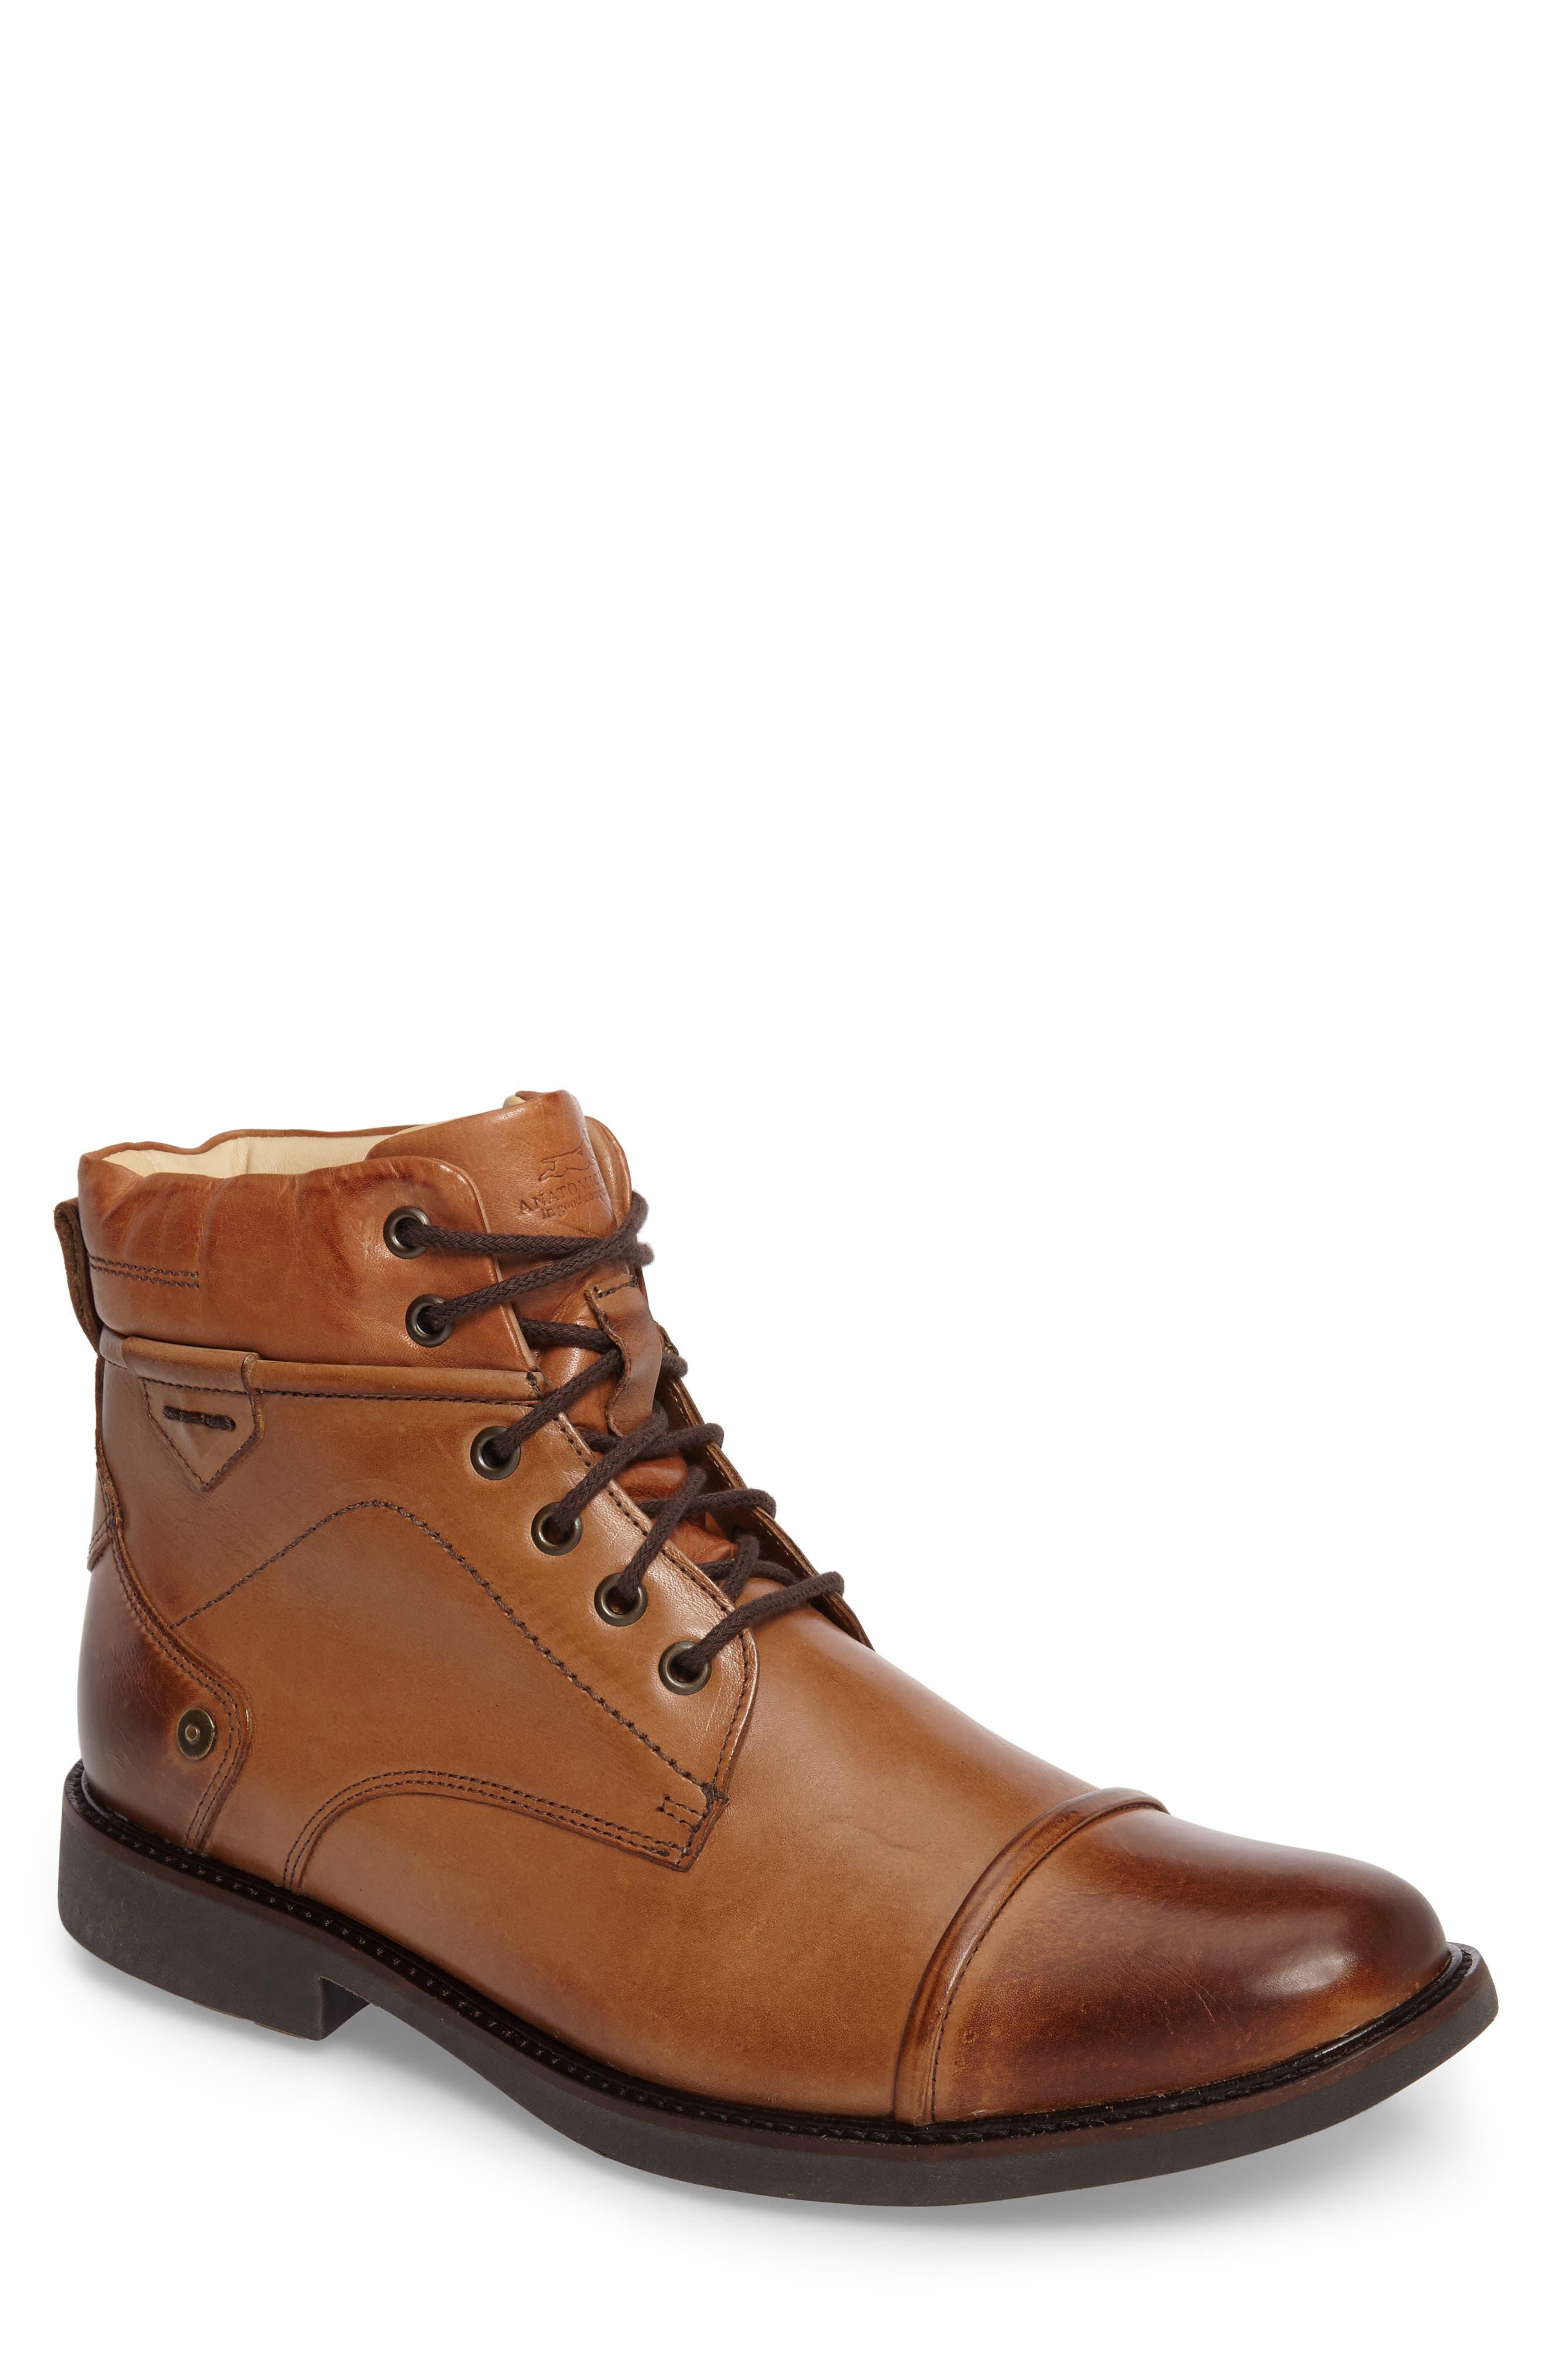 Samuel Cap Toe Boot,                         Main,                         color, TOUCH BRONZE FOXY